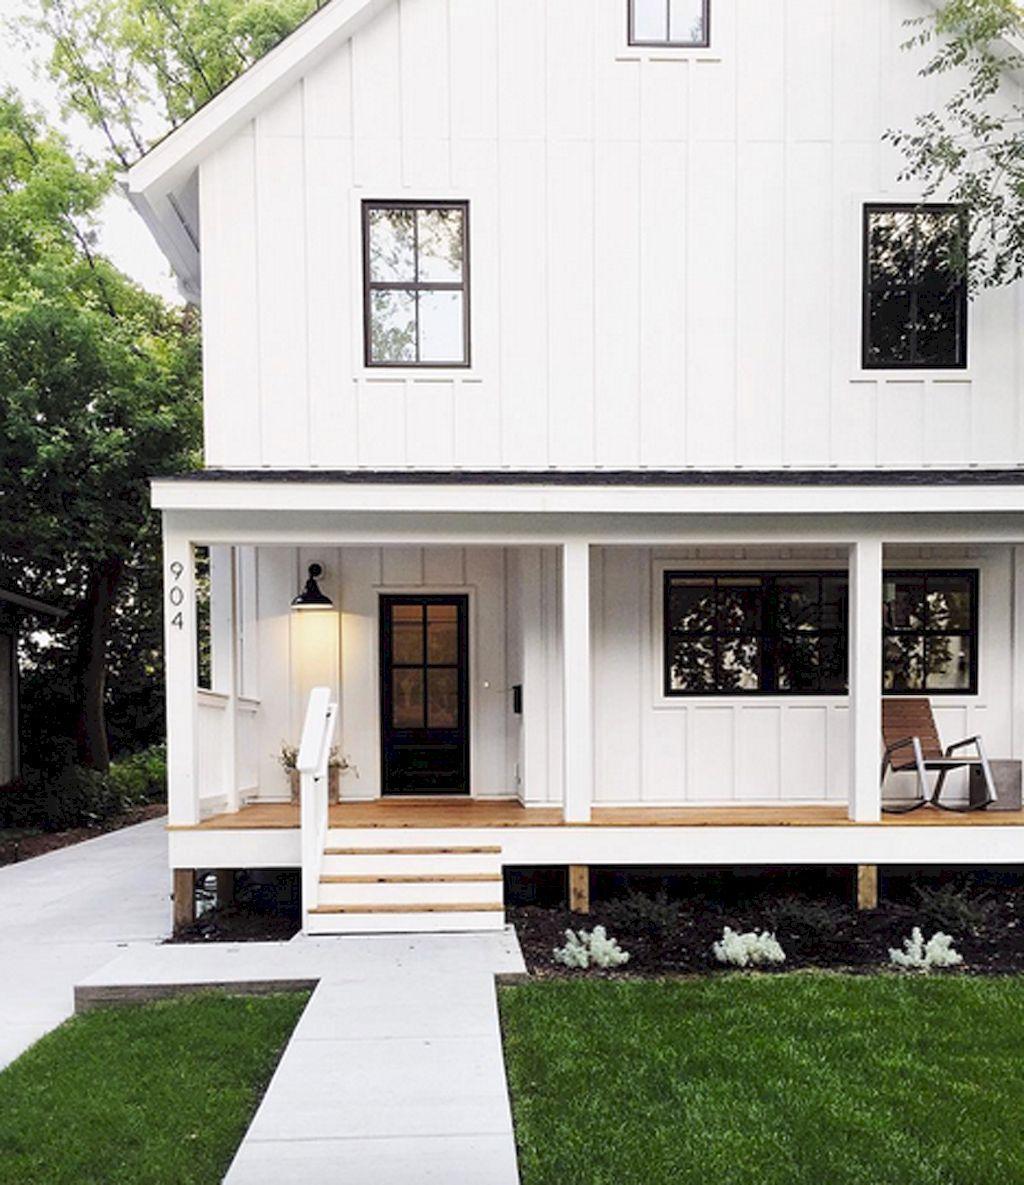 70 stunning farmhouse exterior design ideas (26 | Exterior design